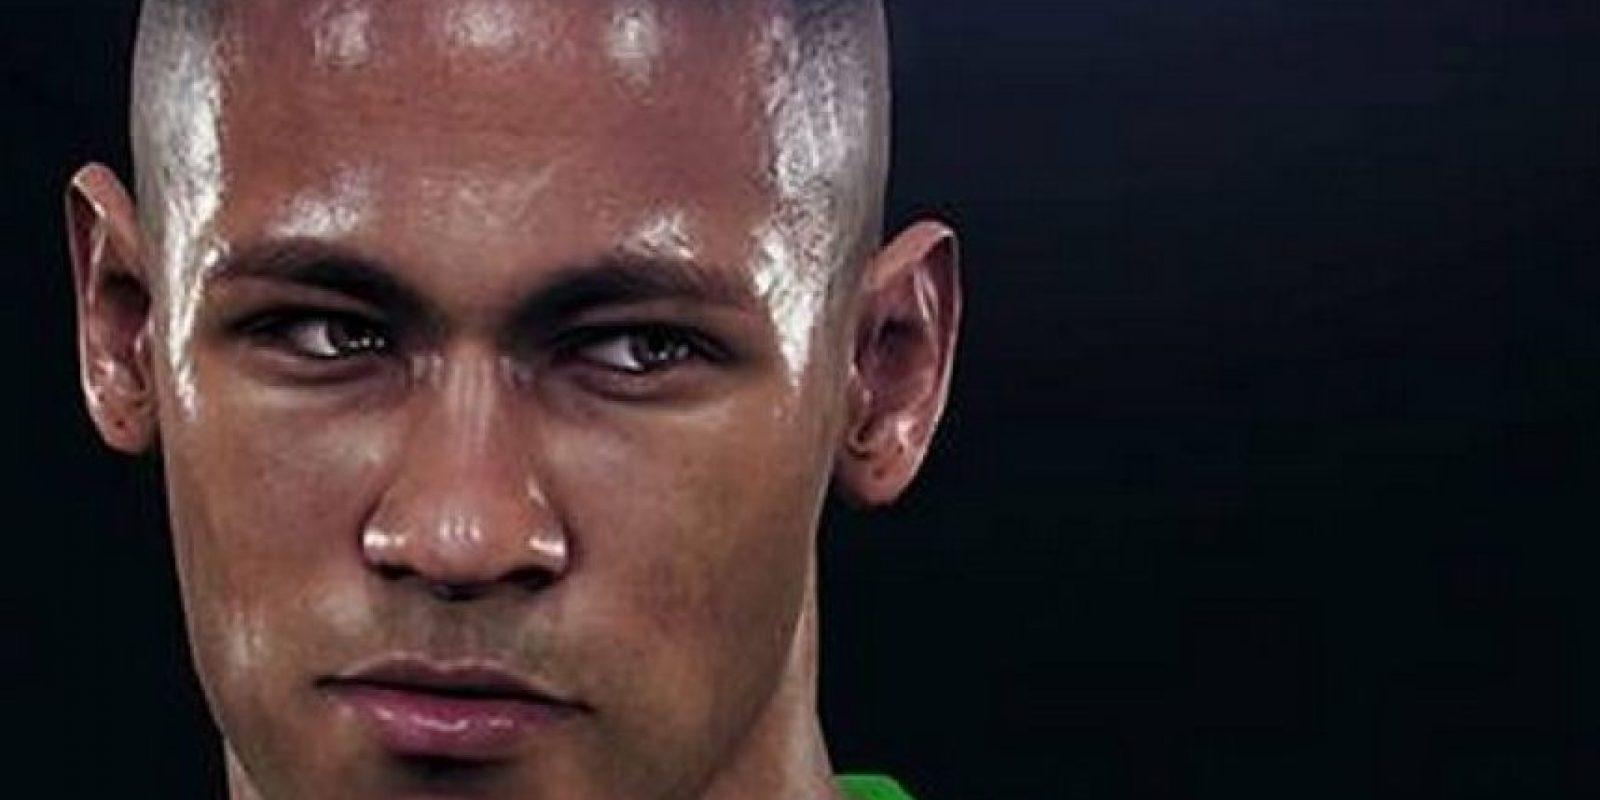 El rostro de Neymar. Foto:Konami